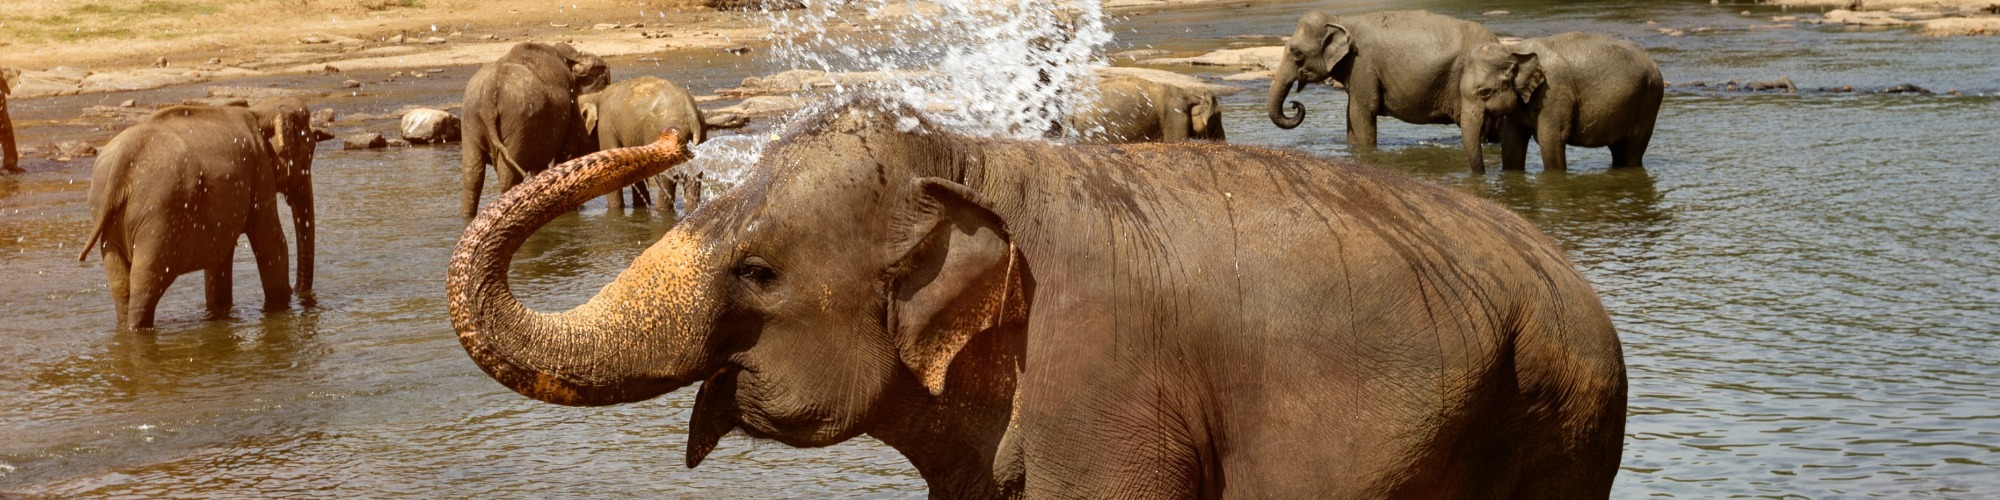 Dronken olifant header